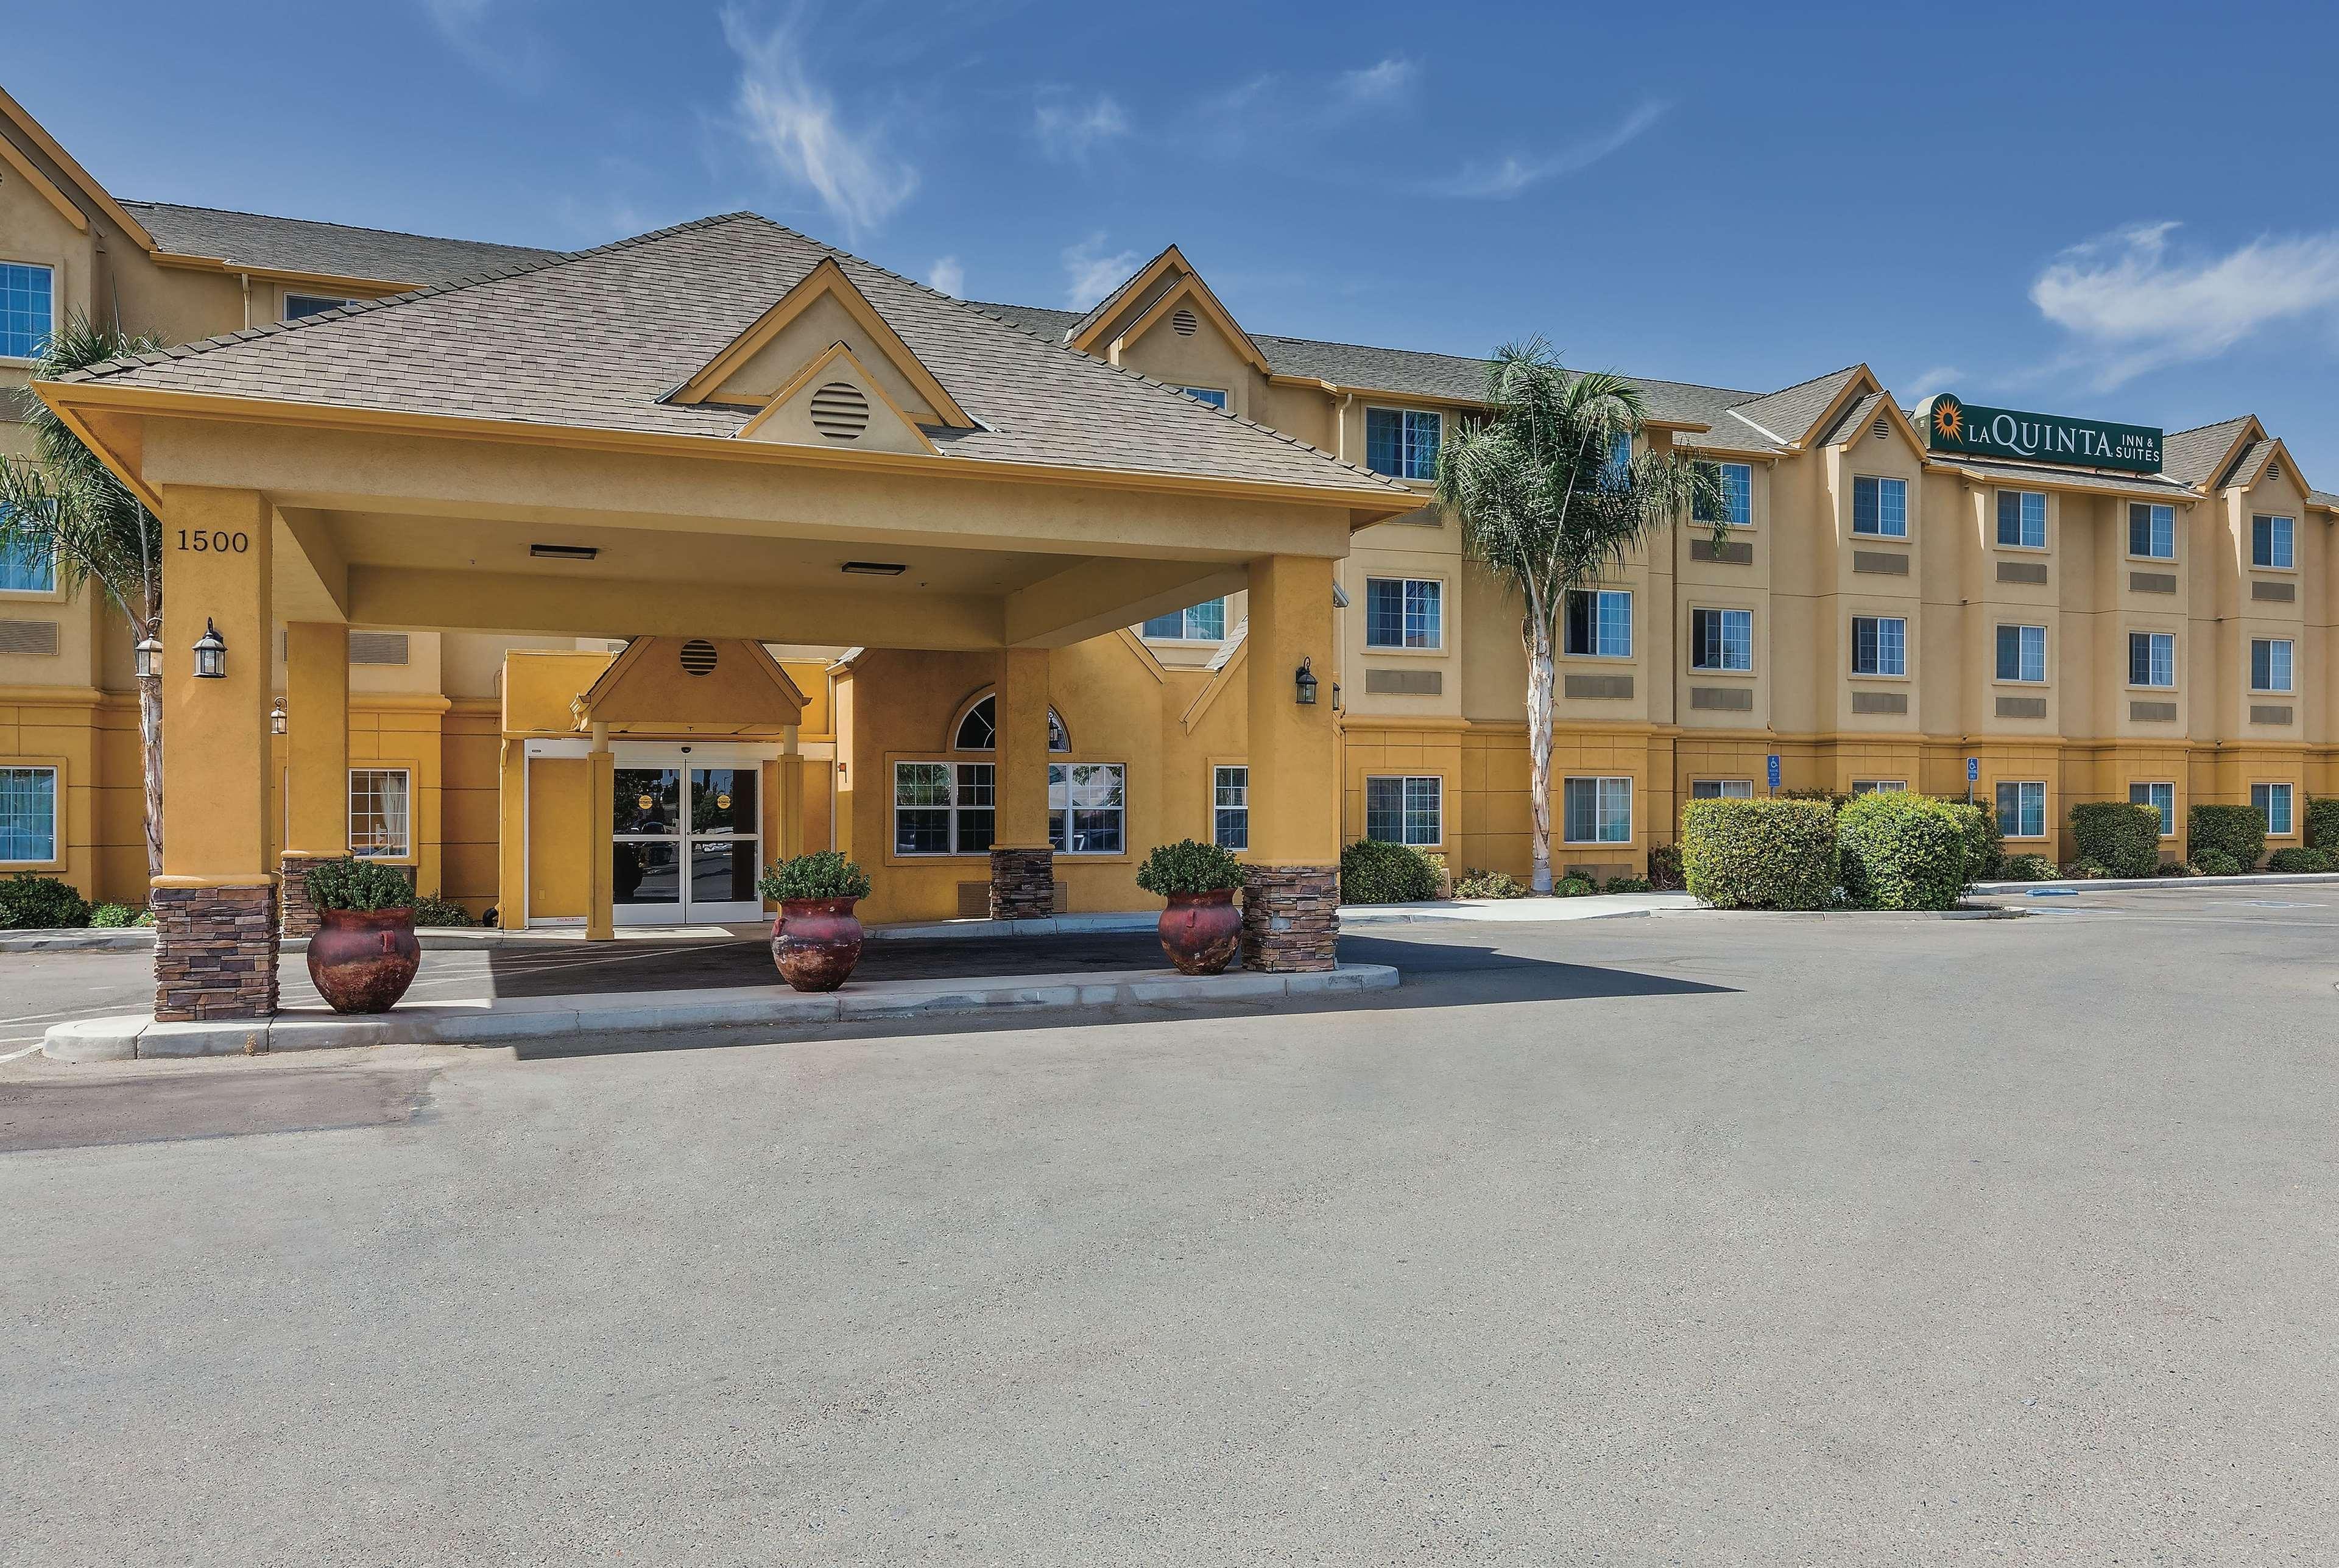 La Quinta Inn And Suites Tulare, Tulare